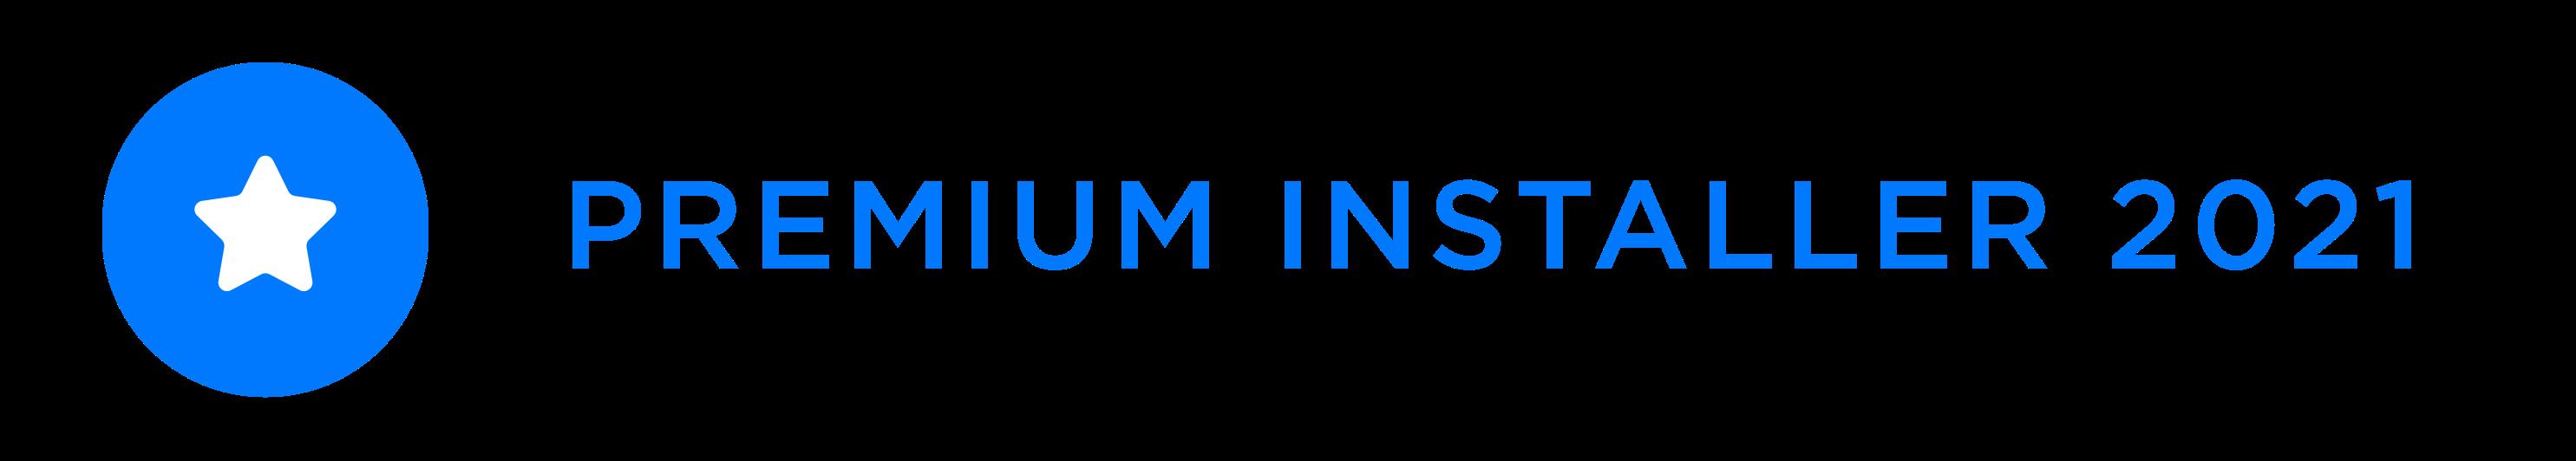 premium badge Tesla 2021